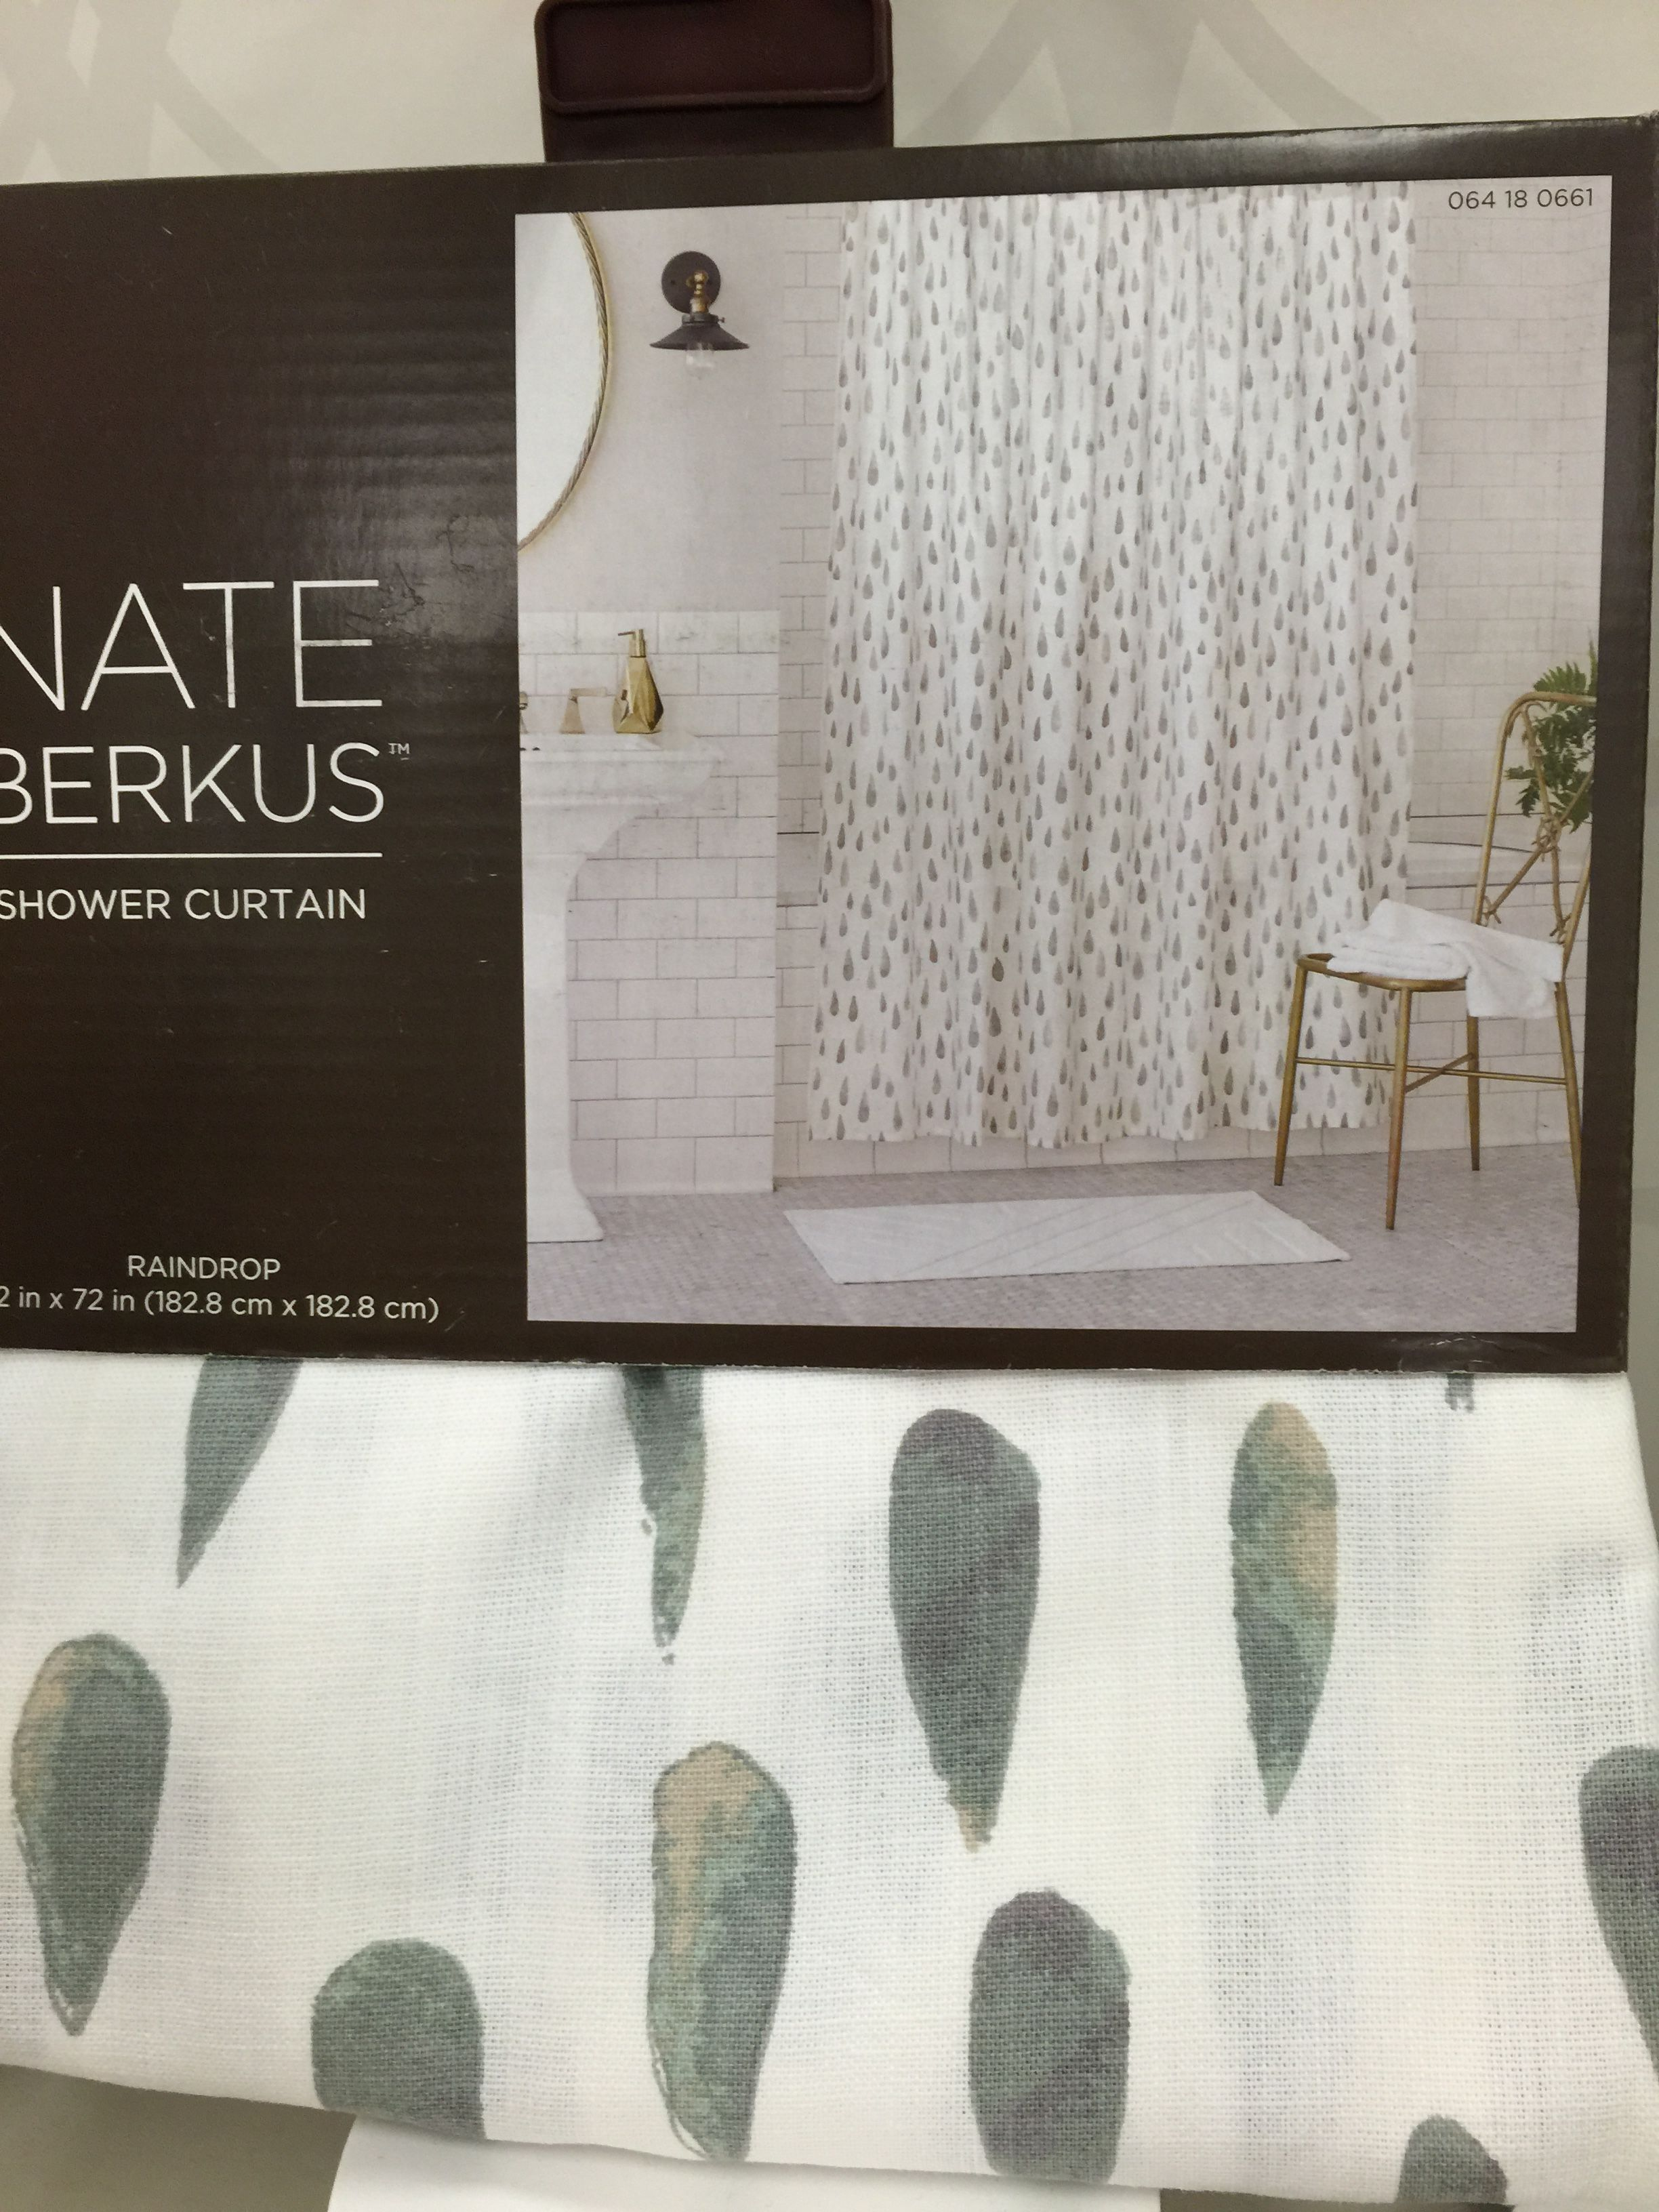 Nate Berkus Raindrop Shower Curtain Home Decor Dream Bathroom Decor